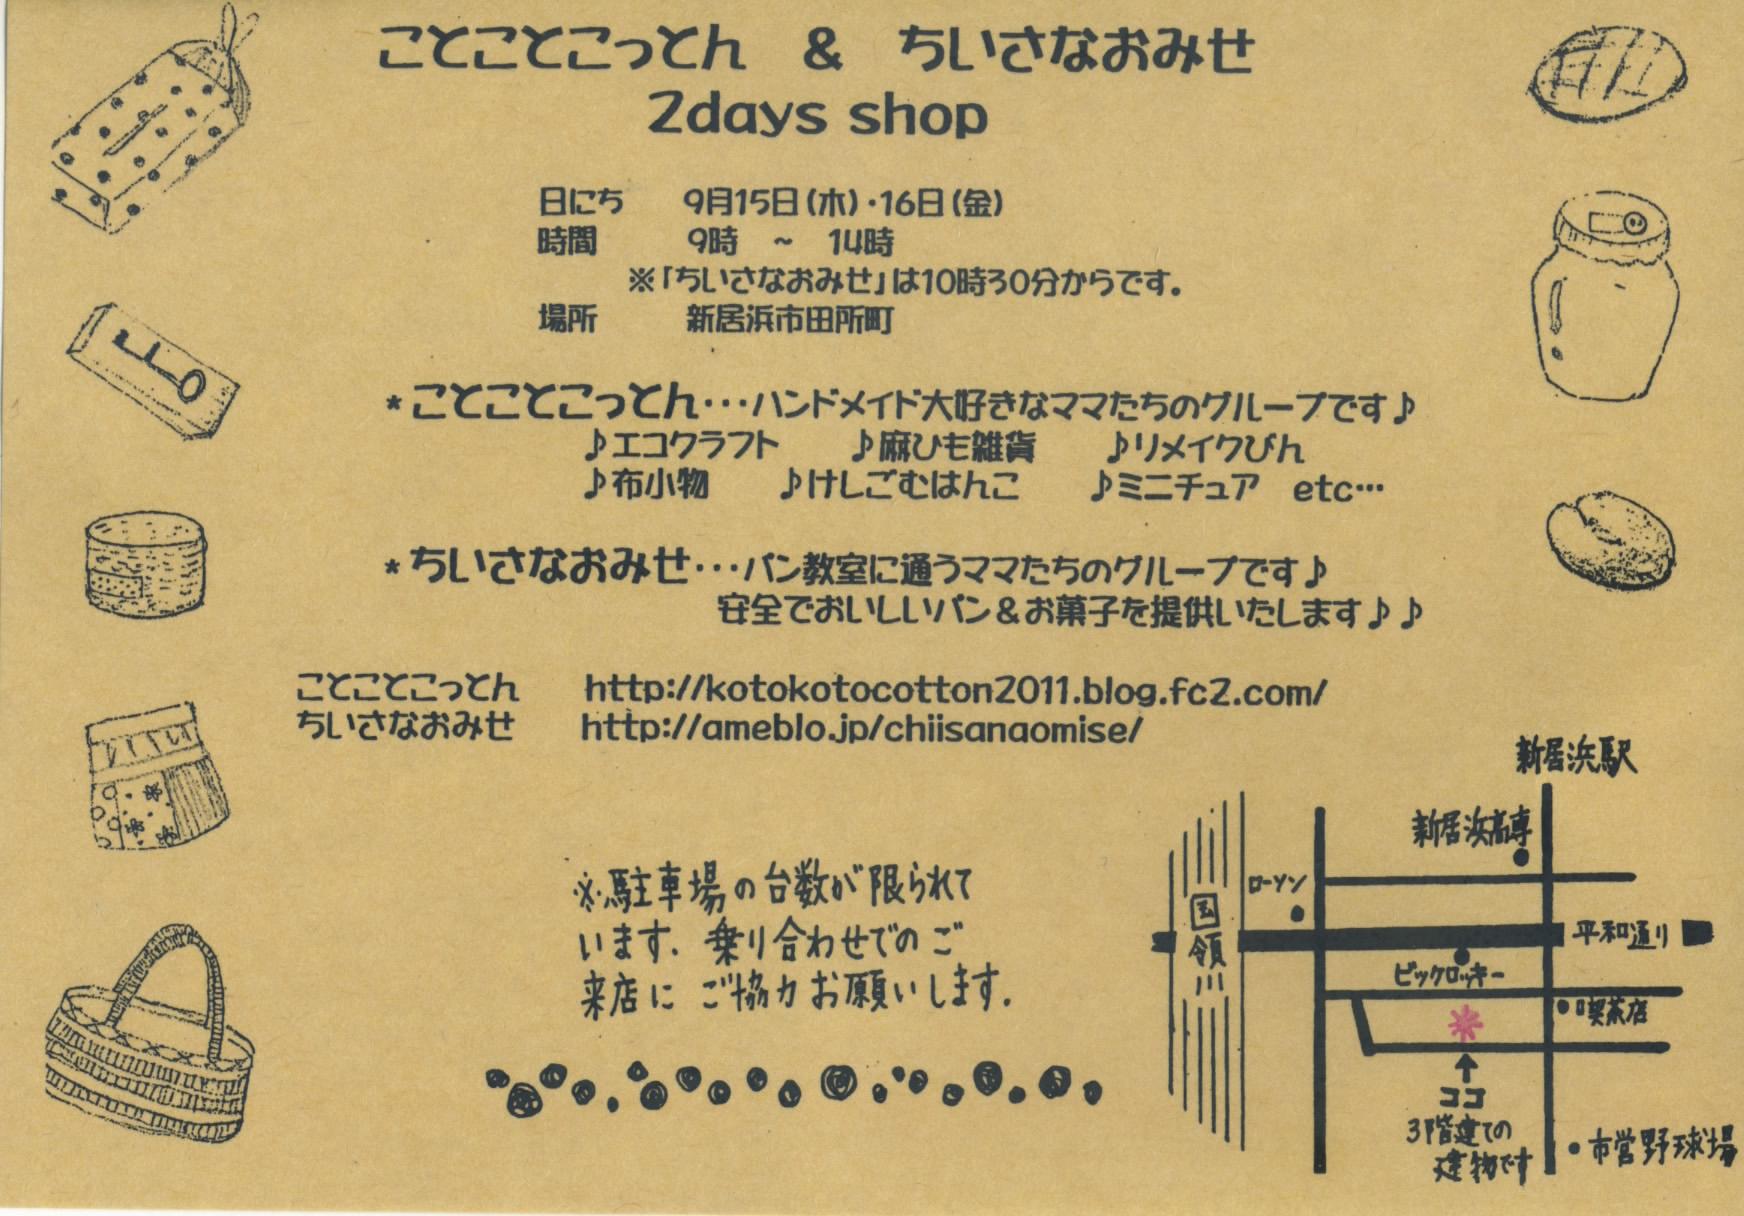 EPSON001-1.jpg